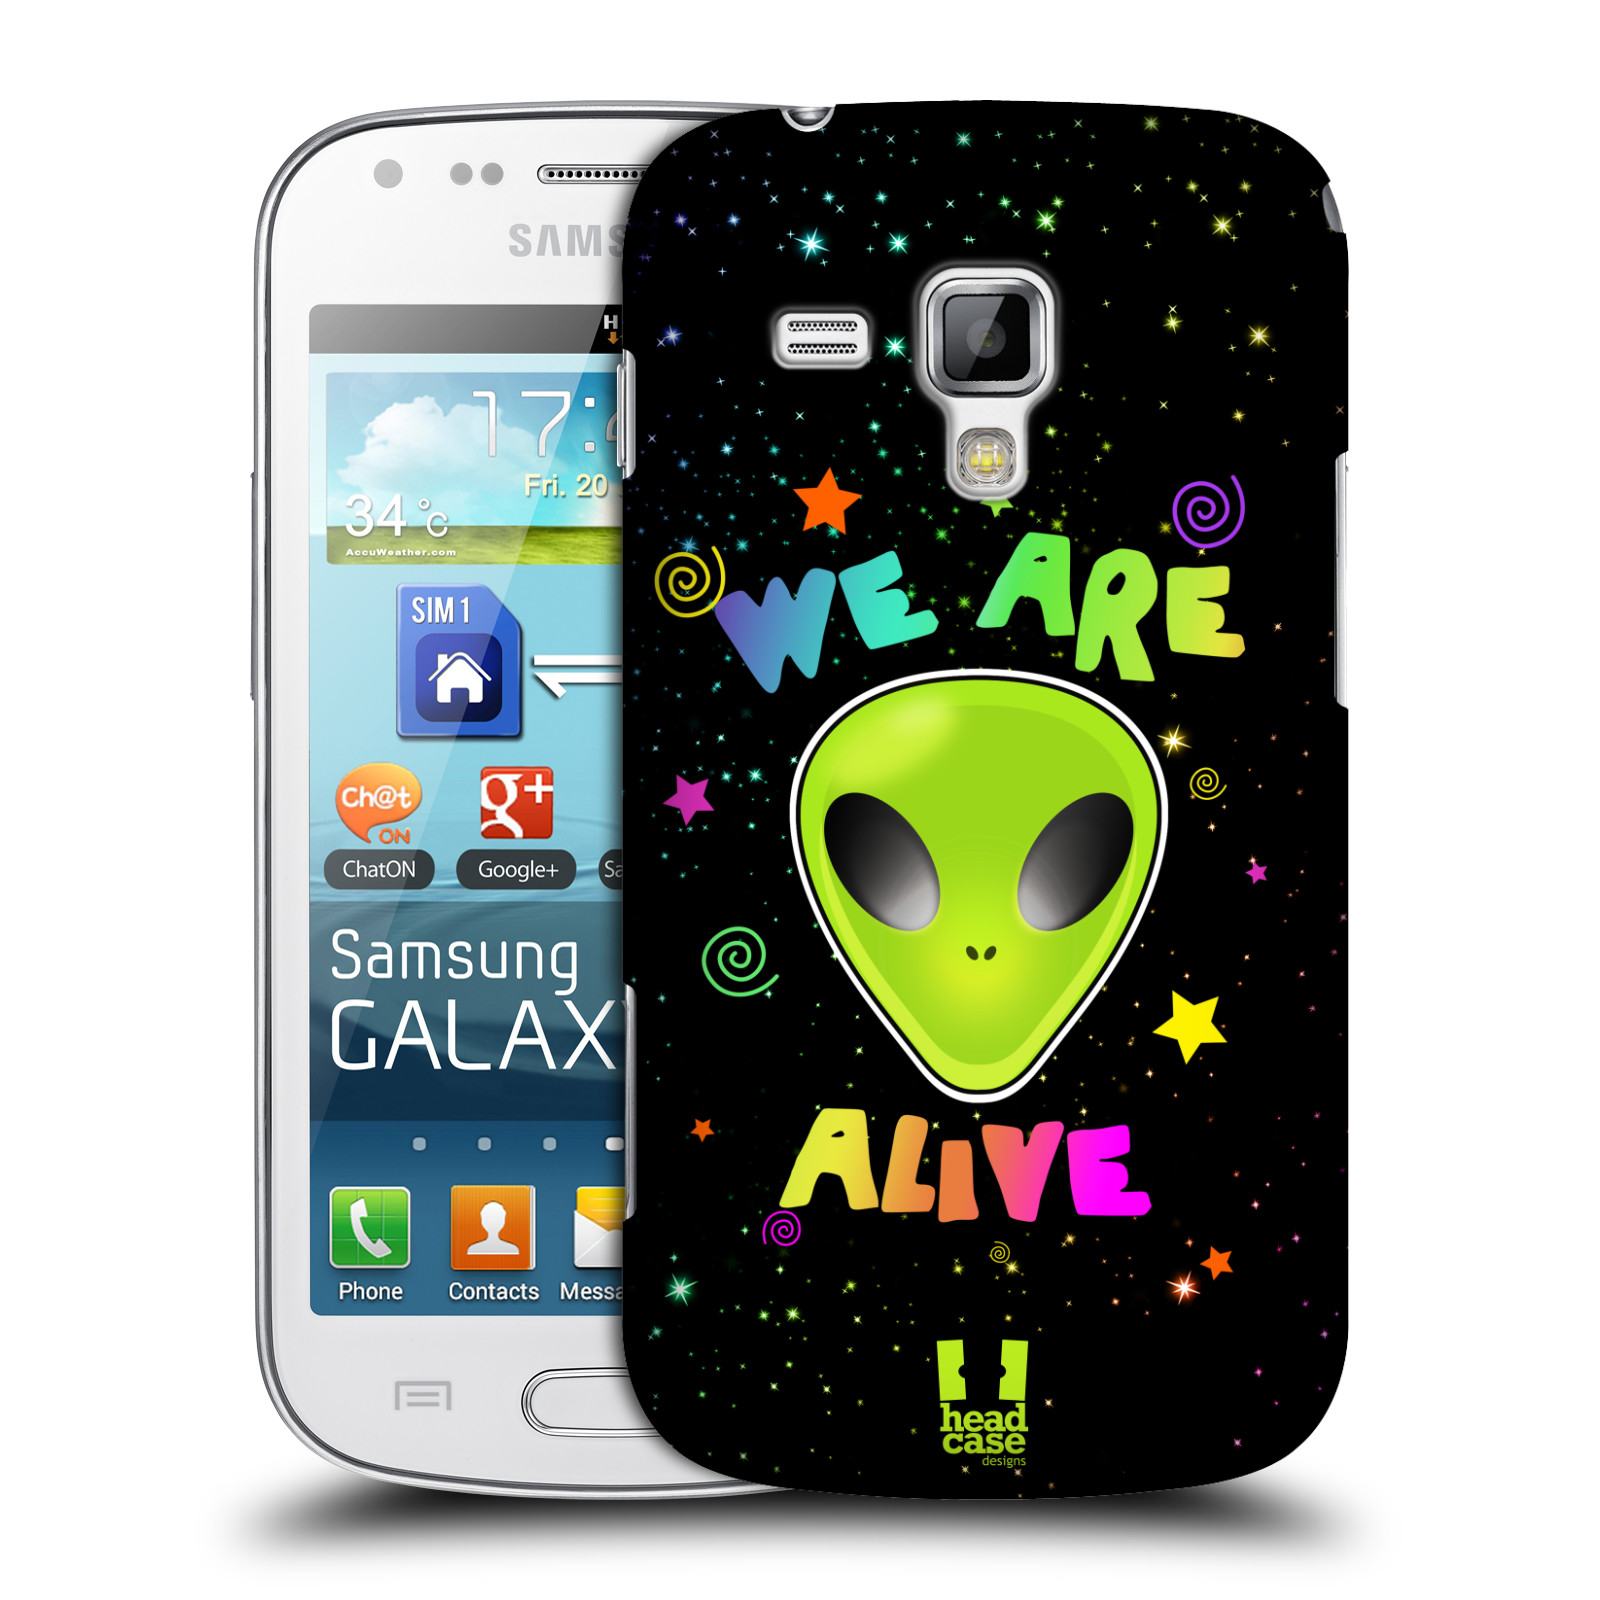 Plastové pouzdro na mobil Samsung Galaxy Trend HEAD CASE ALIENS ALIVE empty ac2bf7a7588